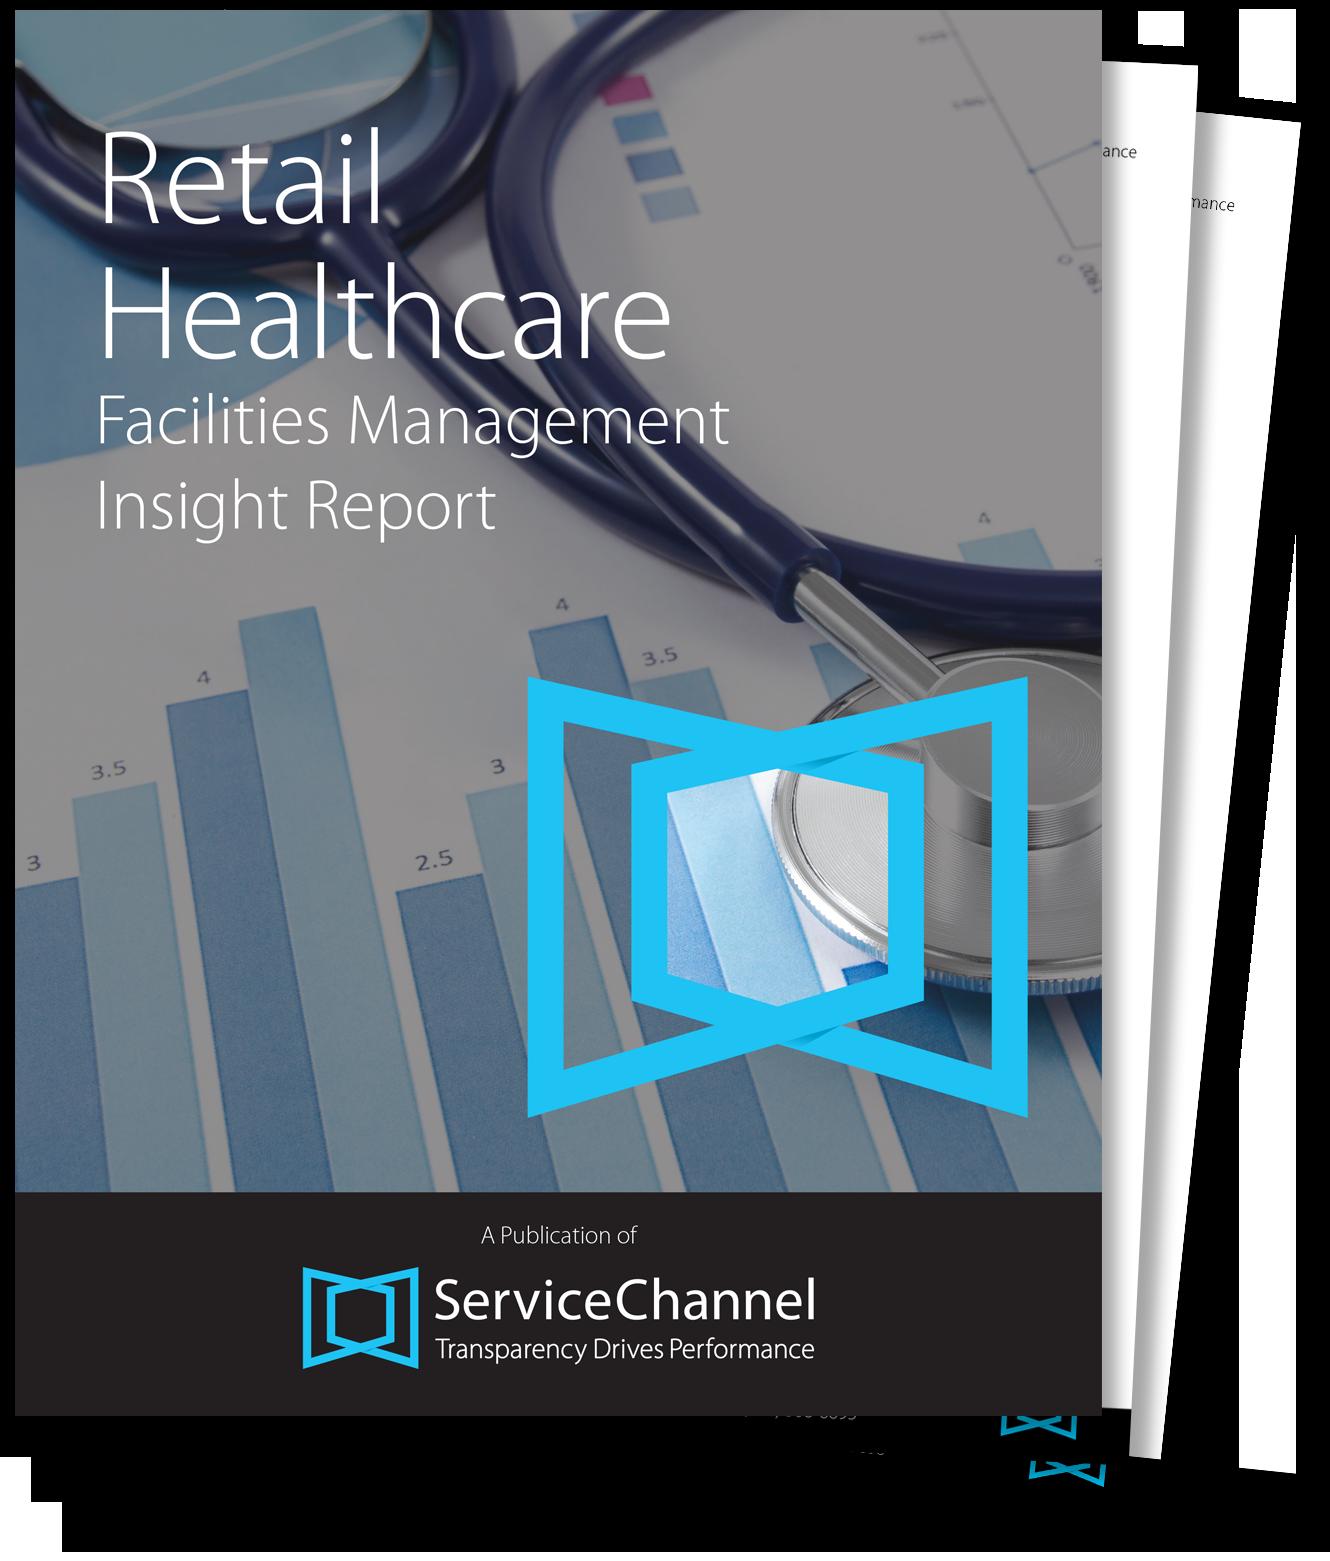 Retail_Healthcare_Facilities_Management_Insight_Report_CTA.png